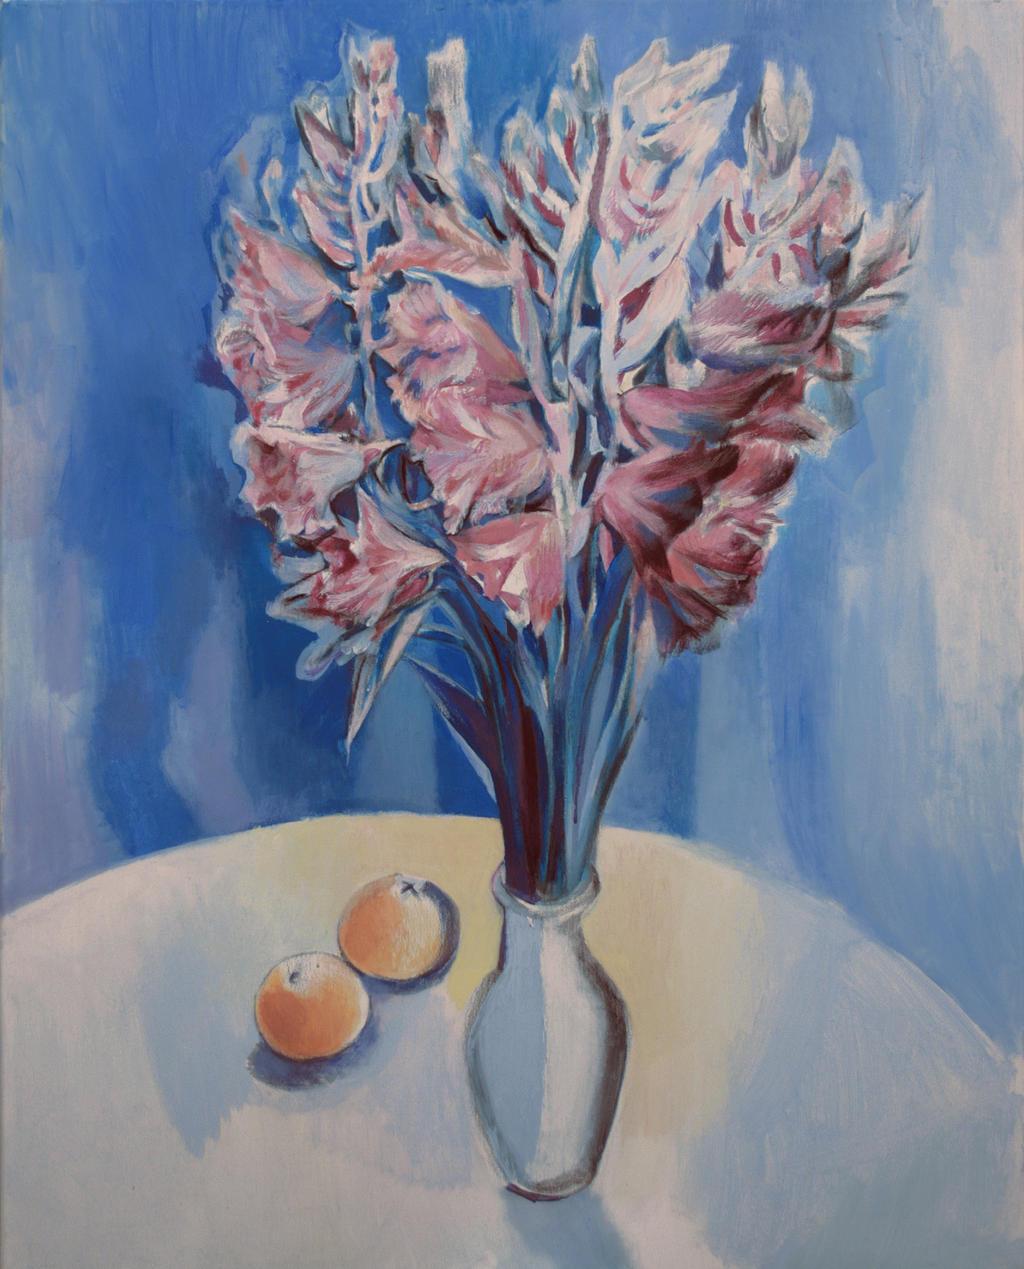 gladioli still life by JuliuszLewandowski